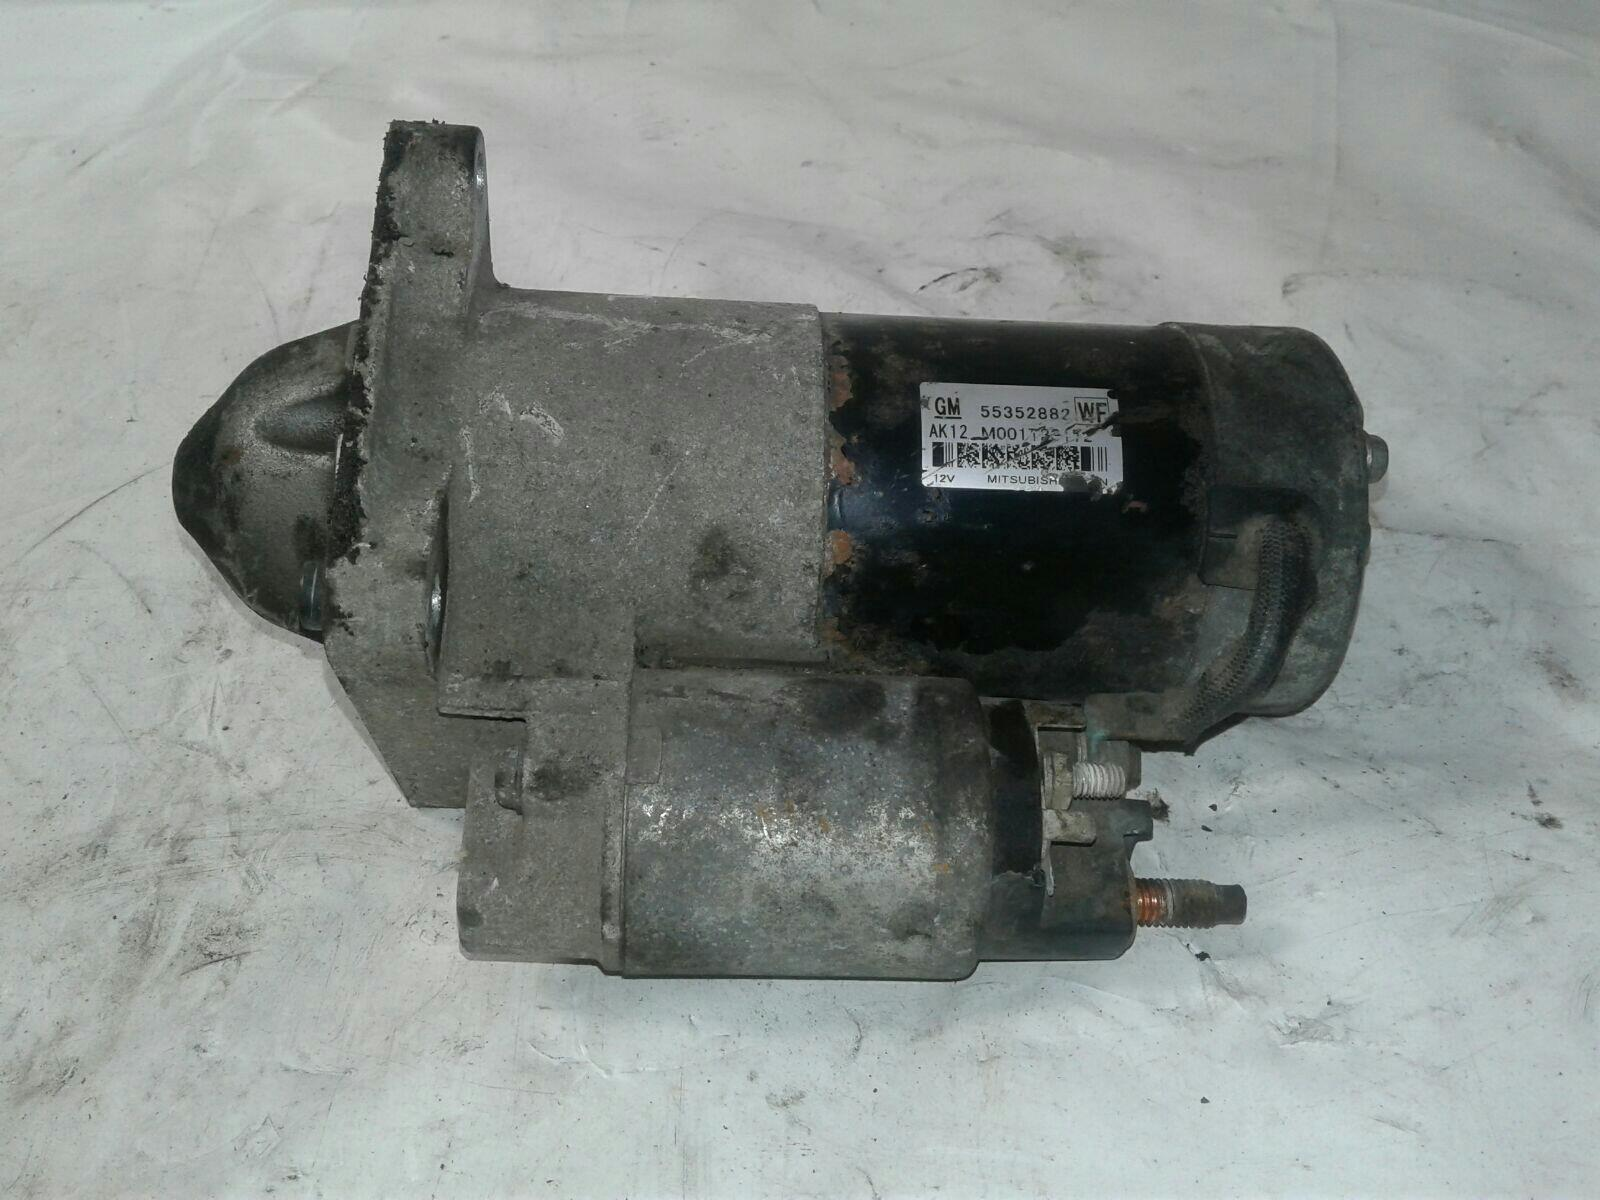 SAAB 9-3 2007 / 2011 Z19DTR - STARTER MOTOR 55352882 & WARRANTY - 7356491